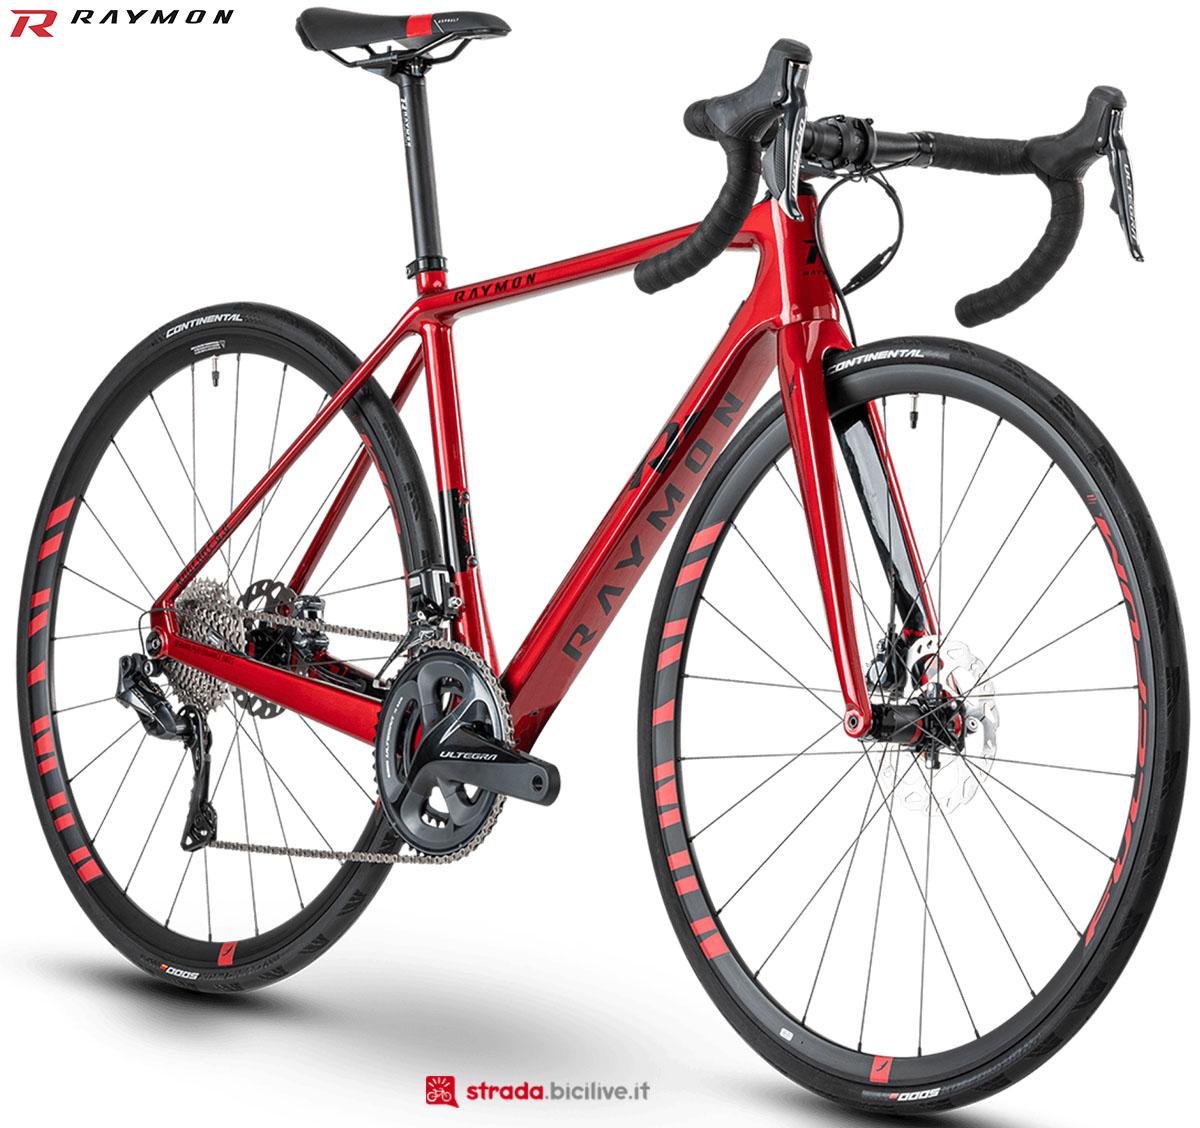 La bici R Raymon RACERAY 9.0 2020